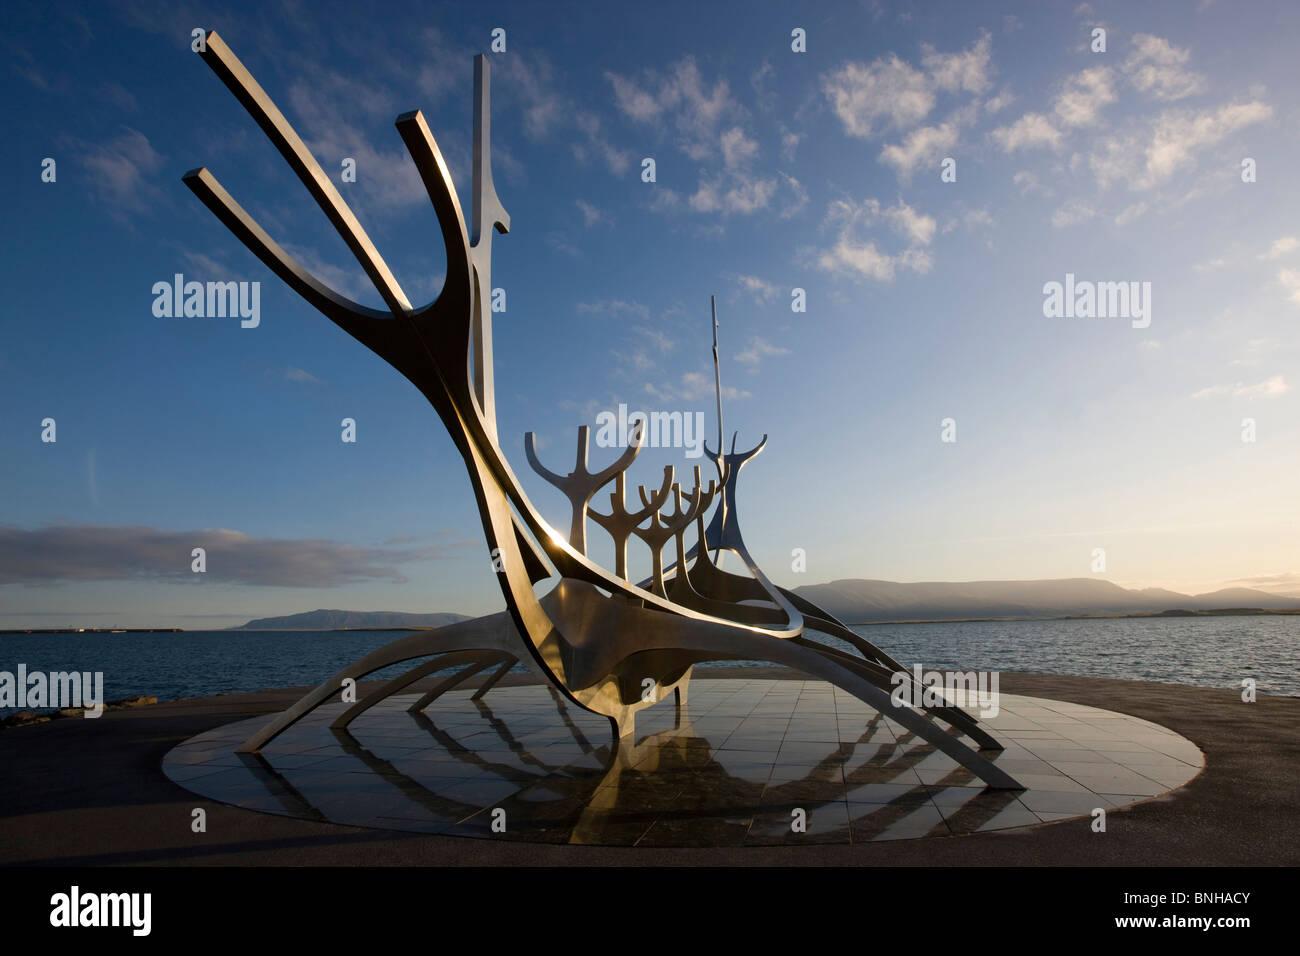 Island Reykjavik Solfar Natur Landschaft Landschaft Reisen Architektur  Skulptur Von Jon Gunnar Arnason Moderne Kunstwerke Viking